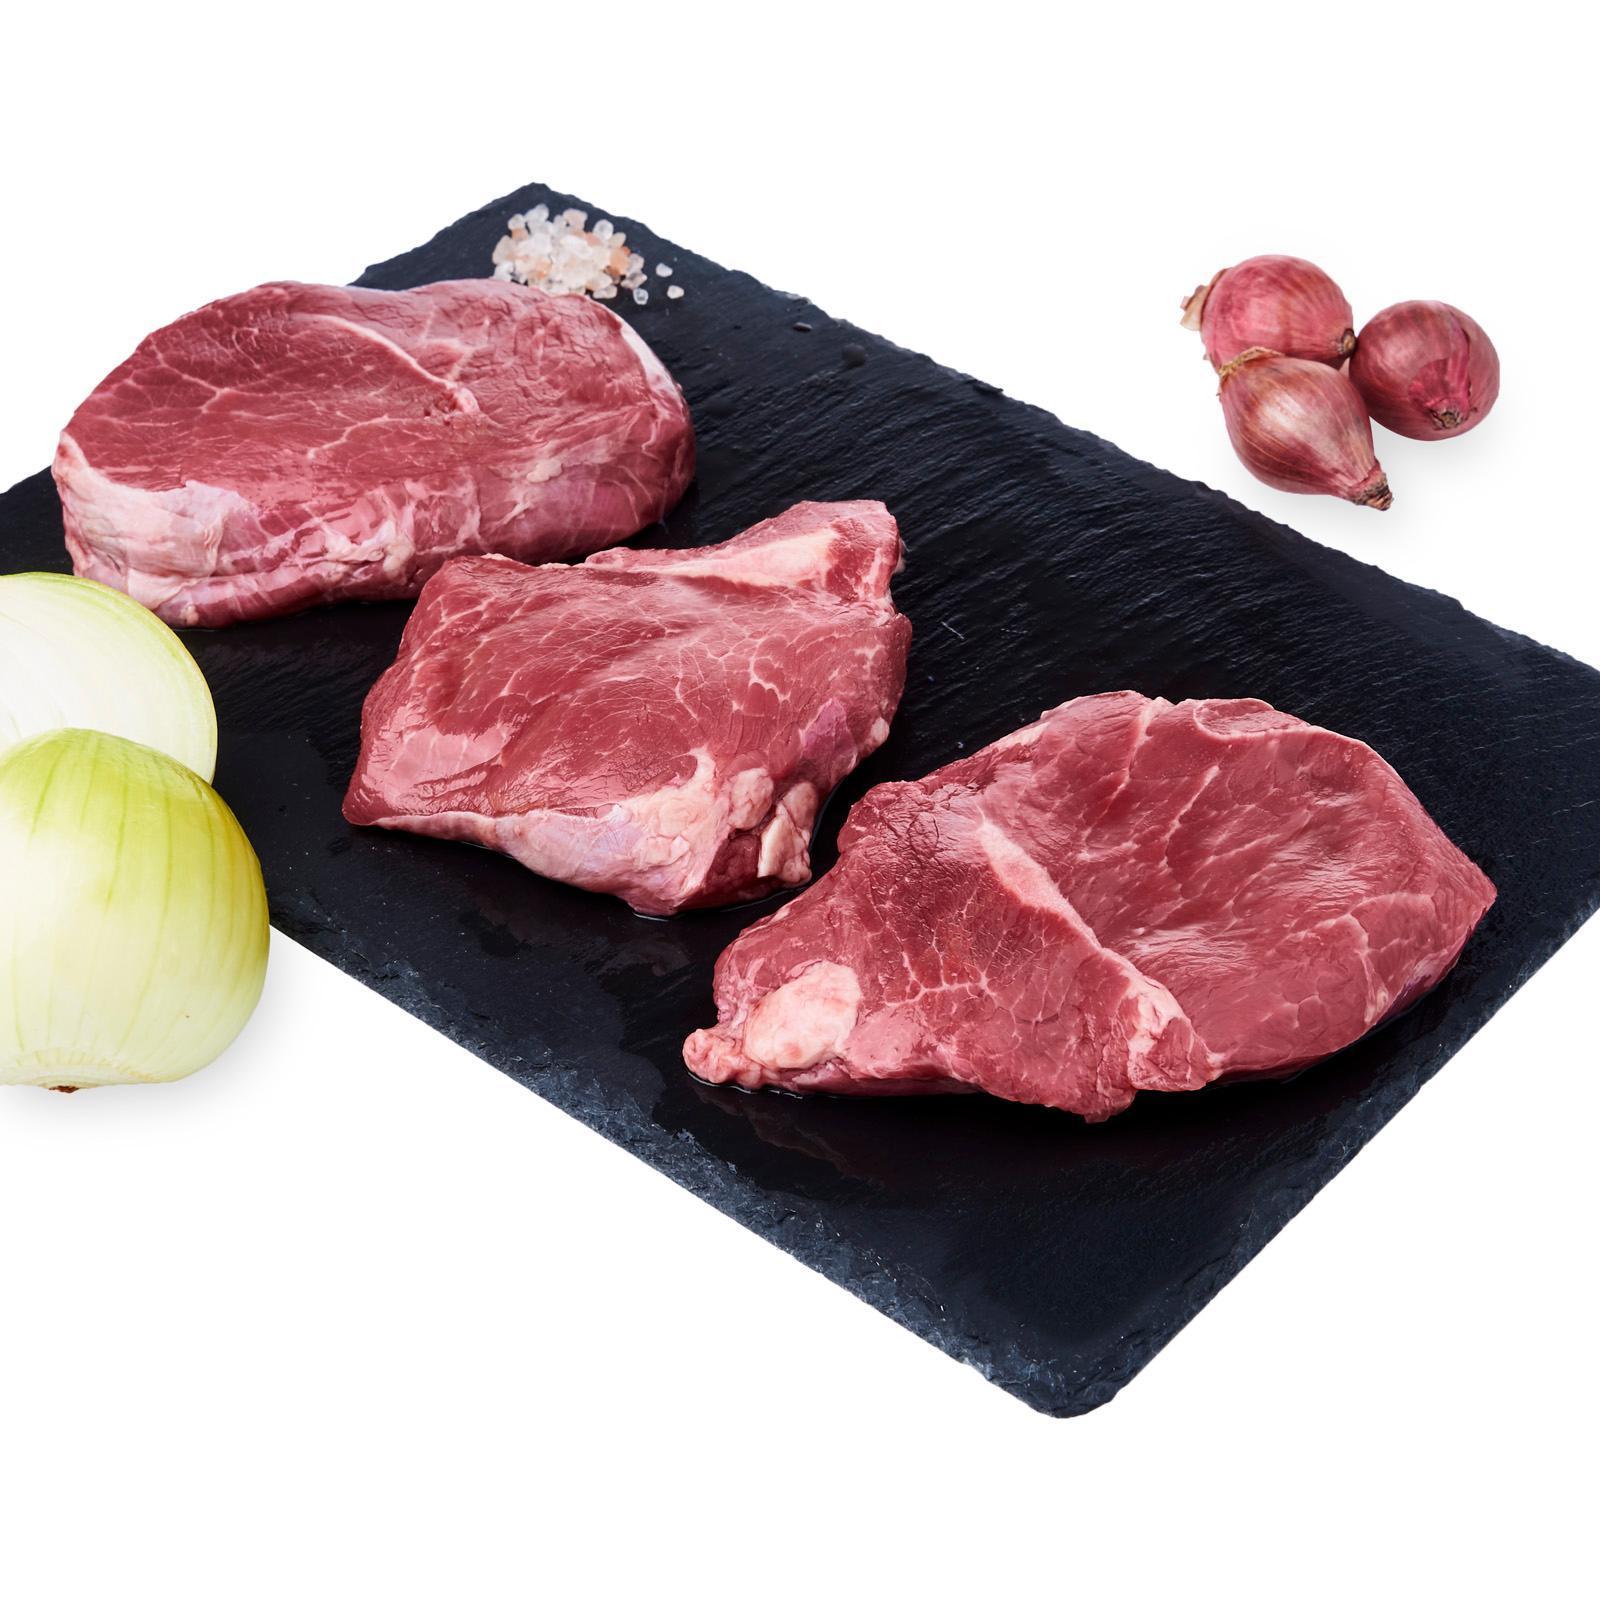 AW'S Market Chilled Chuck Tender Steak